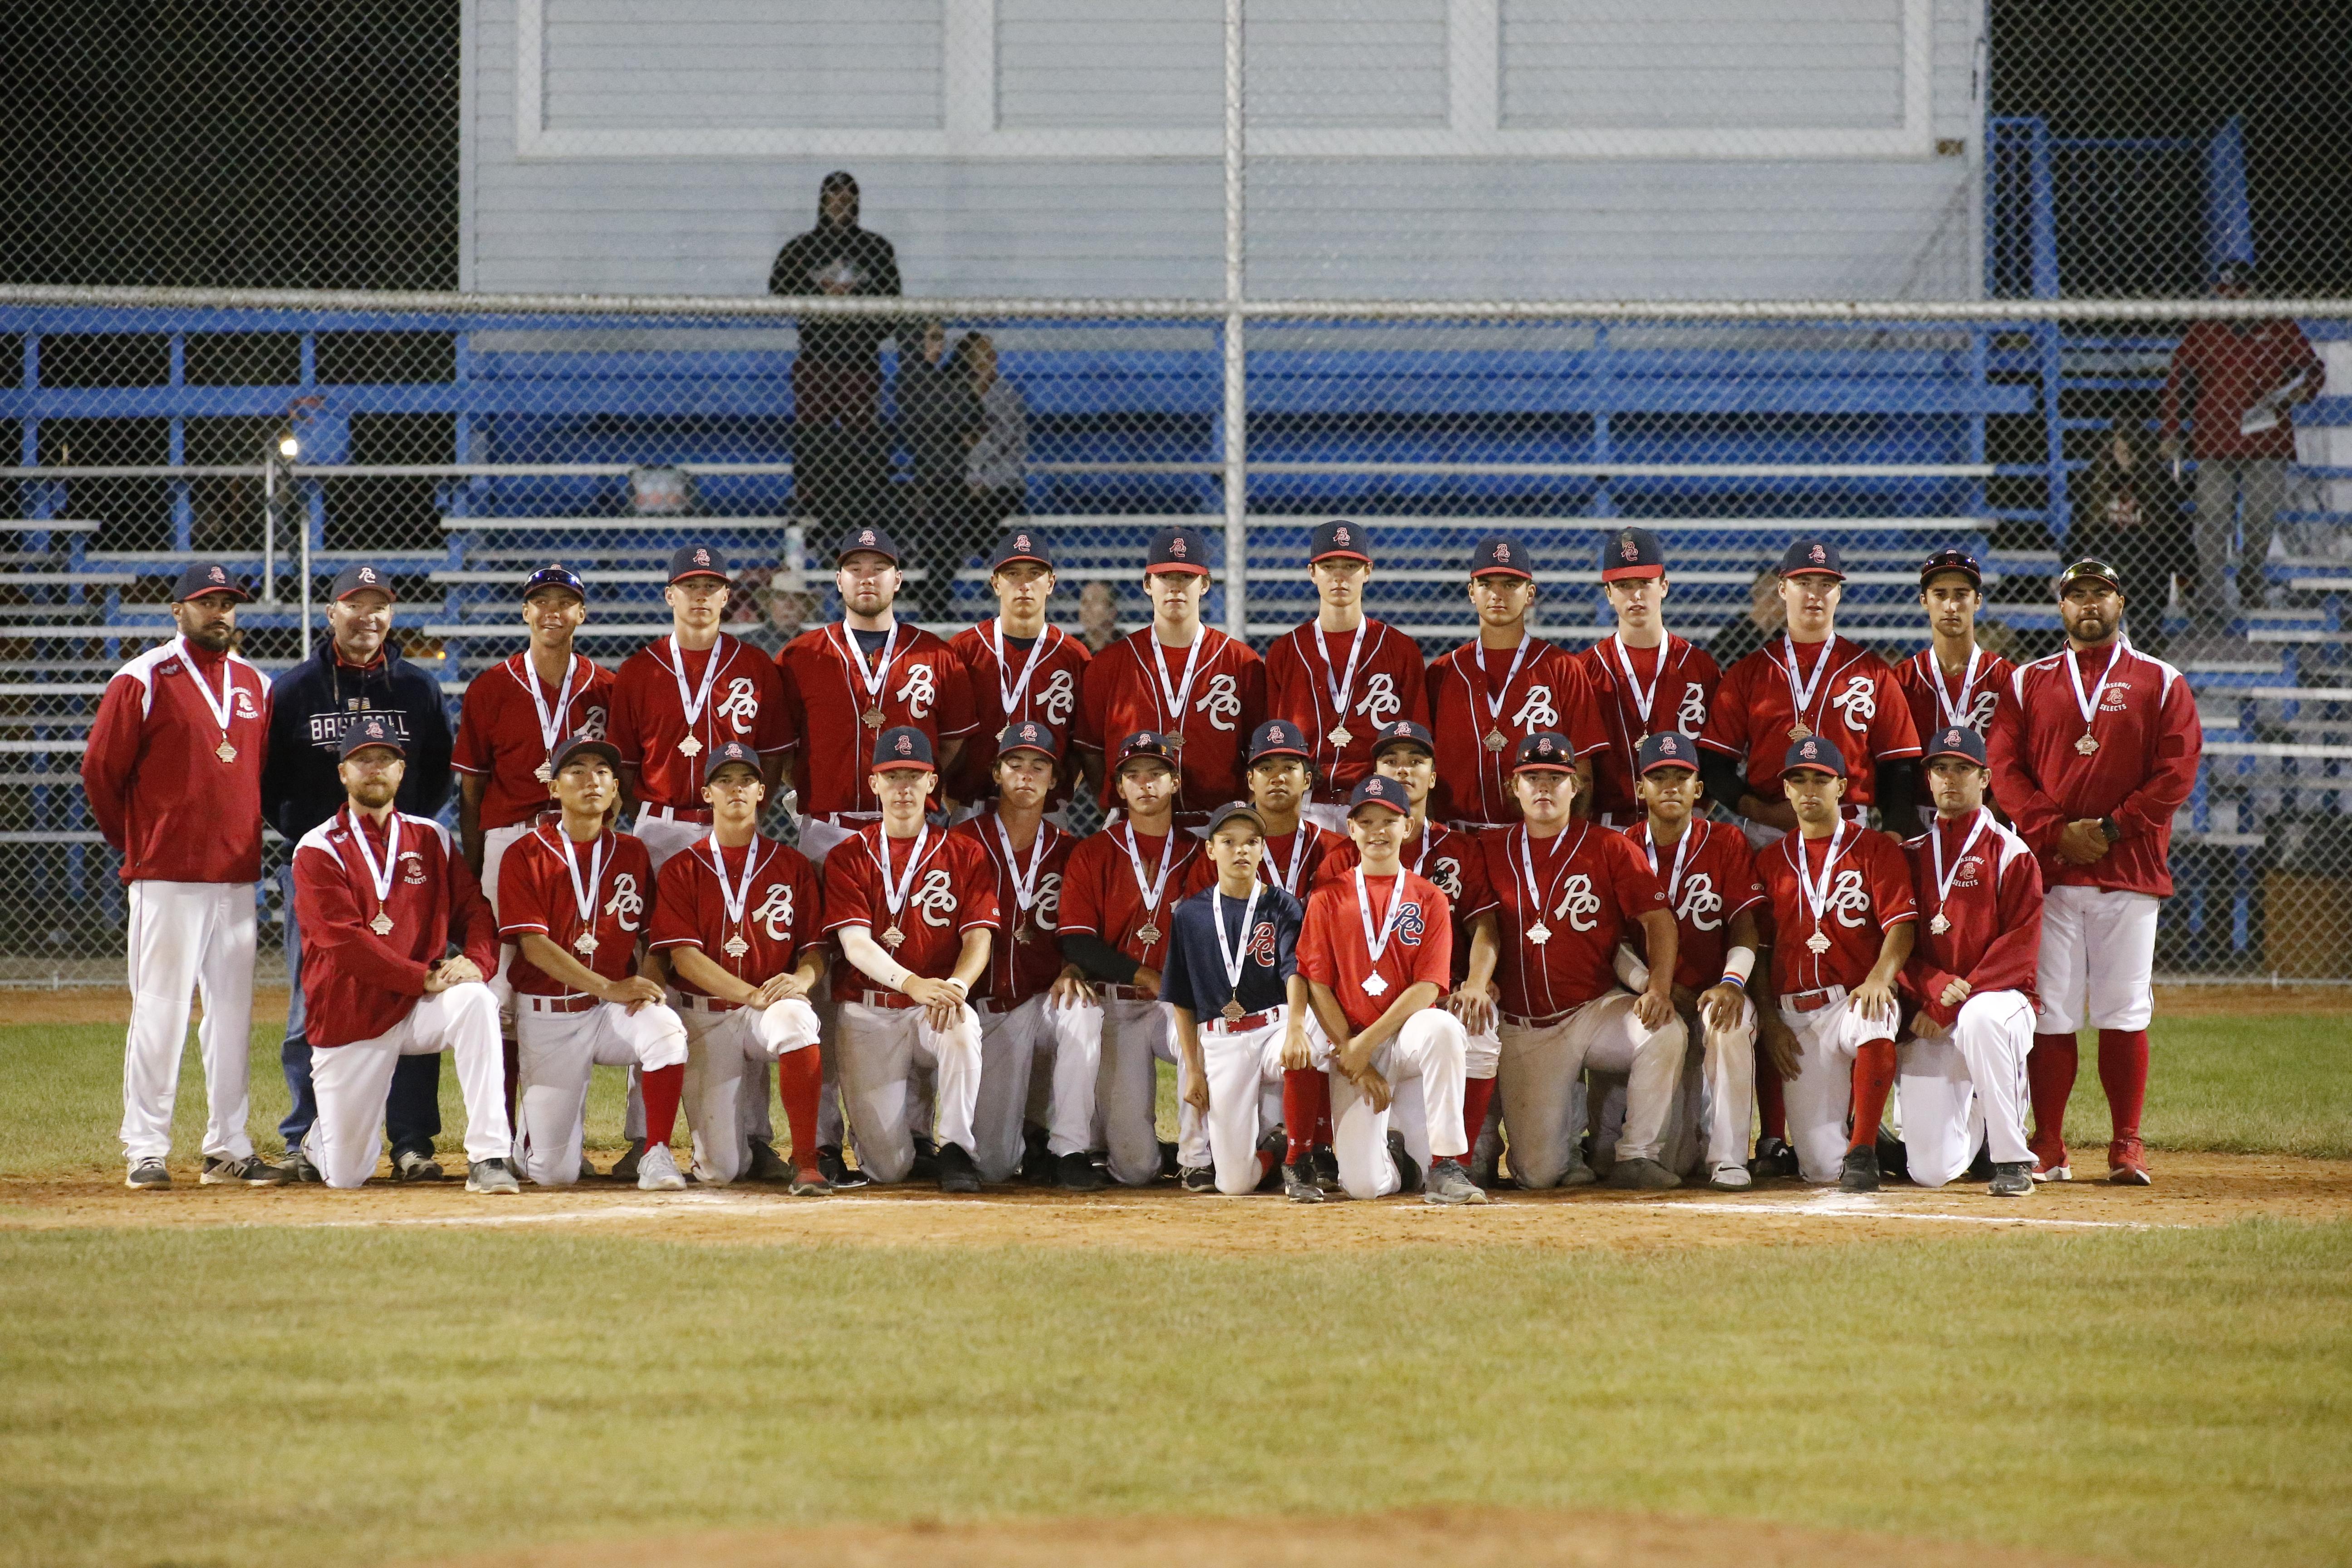 Medal Presentations, Professional Photo Pics Baseball Canada Cup - Image 7